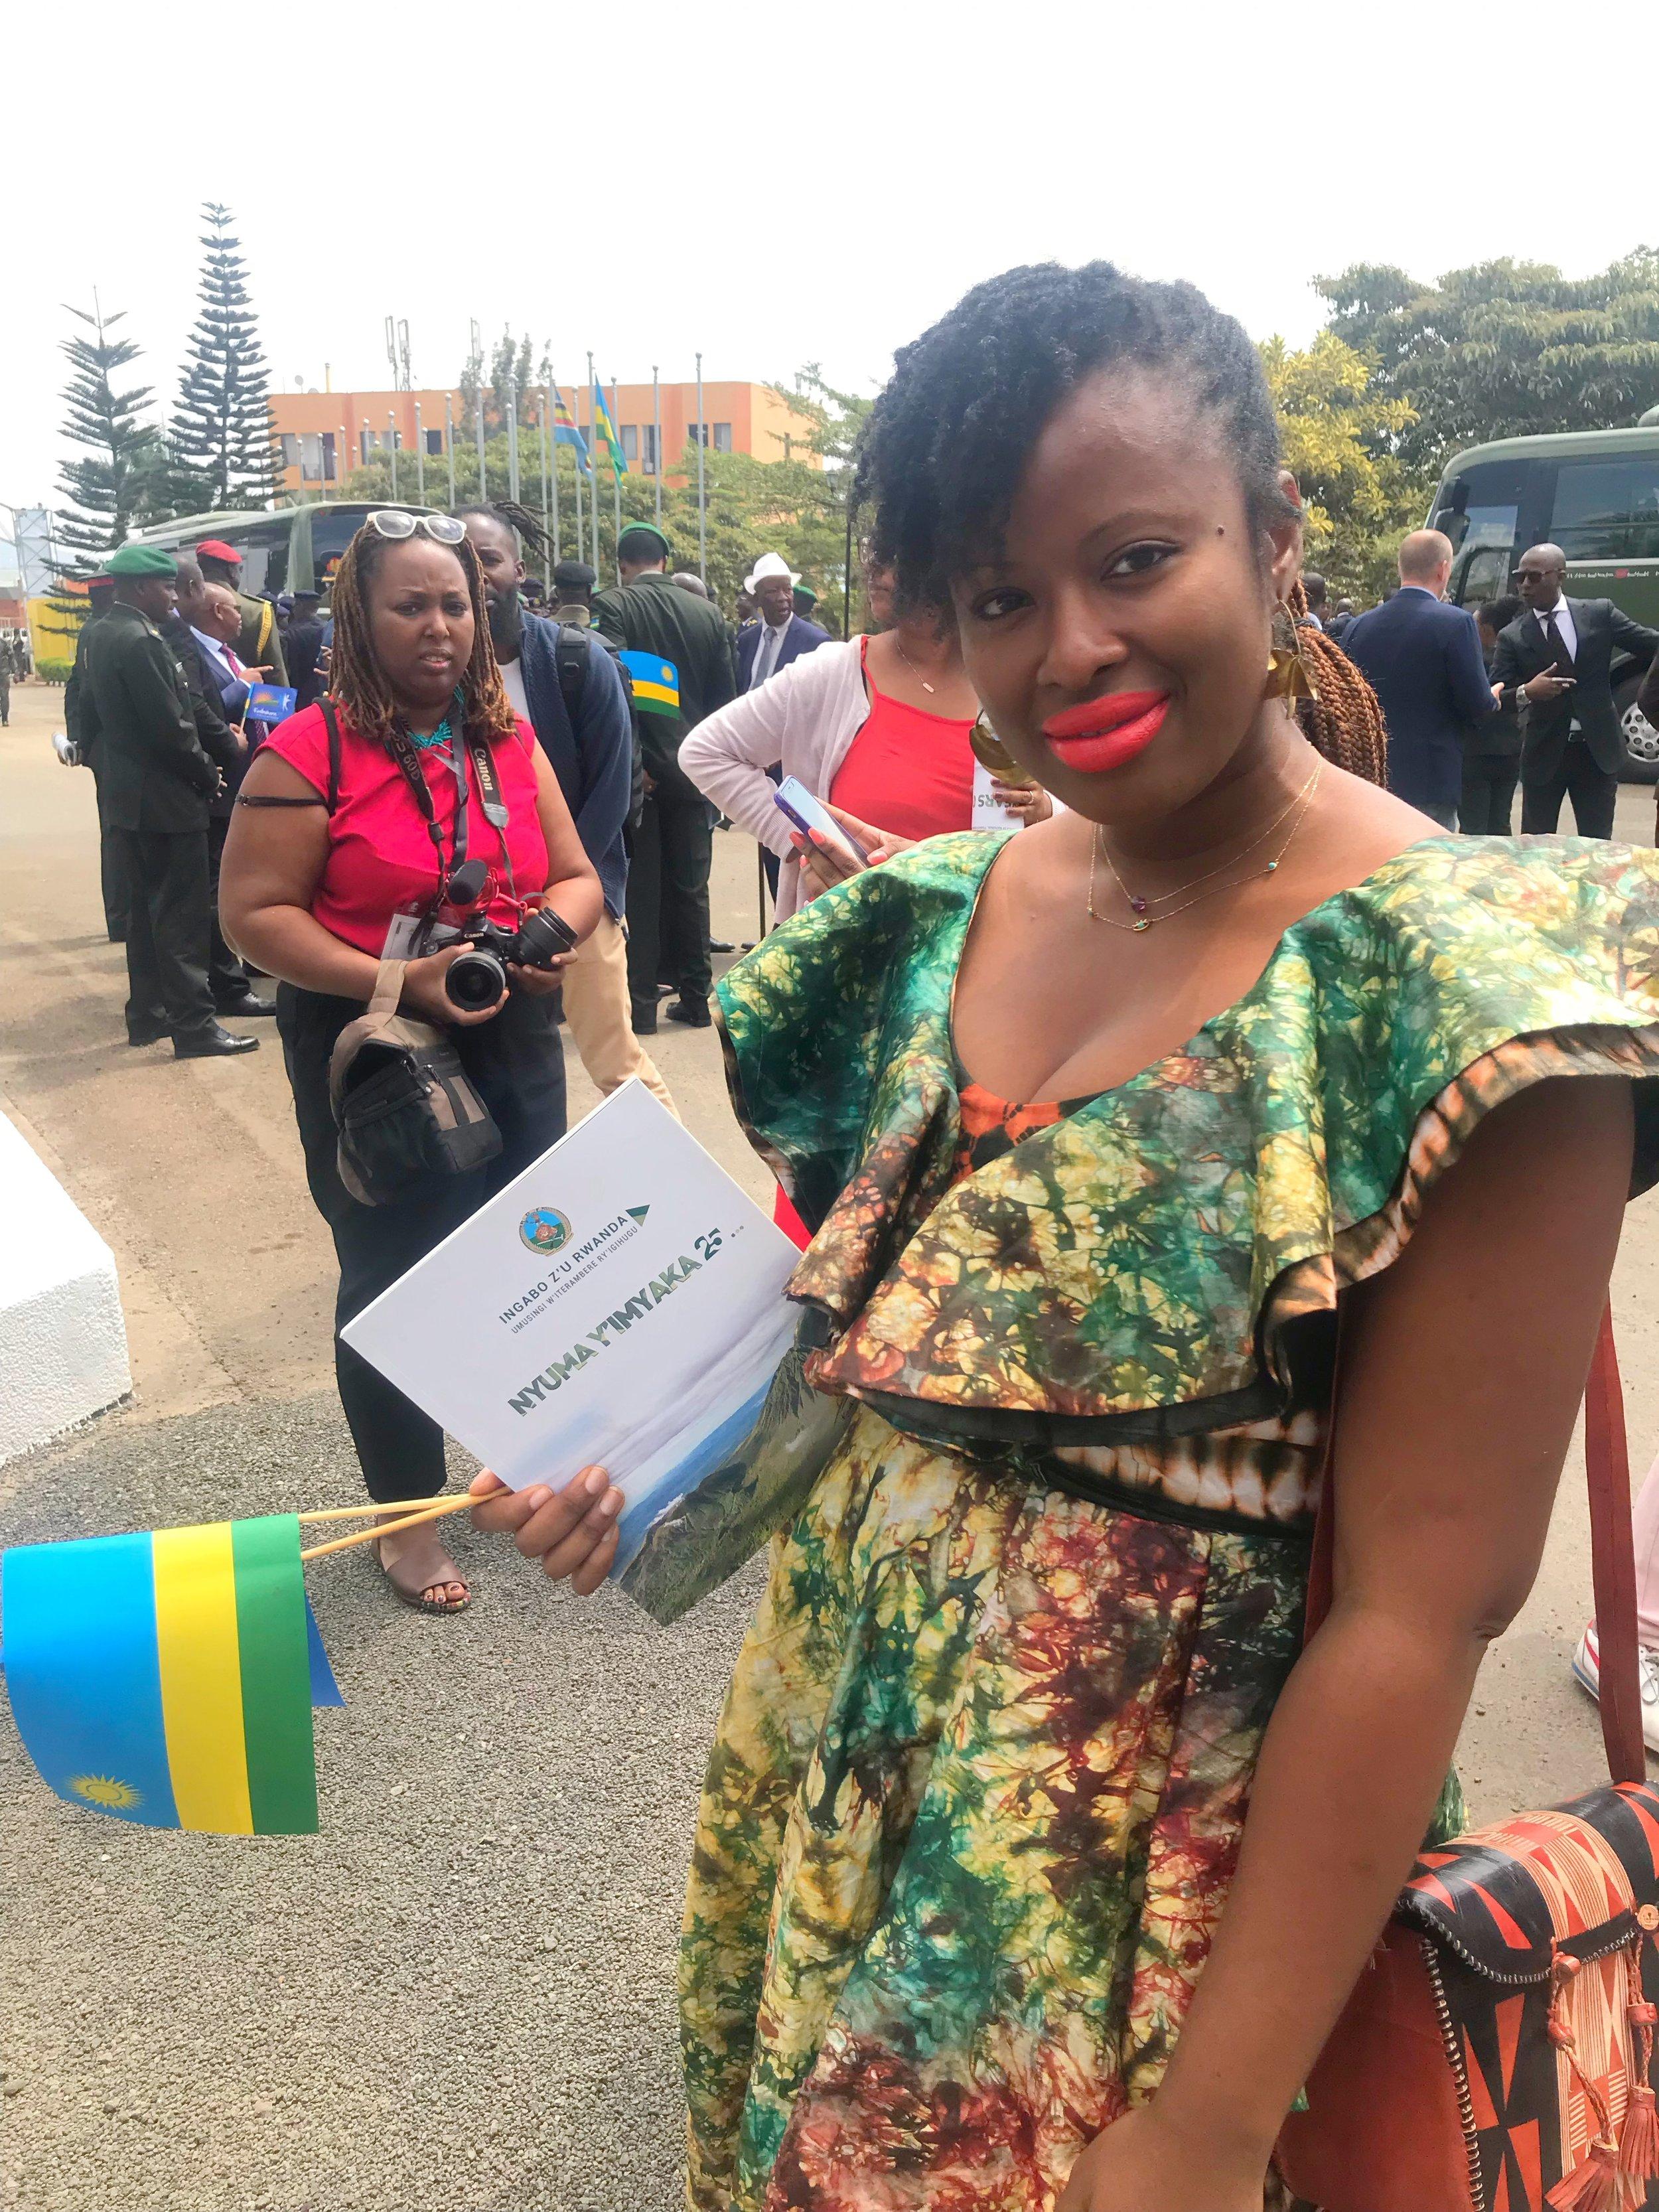 IMG_5873_Facetune_04-07-2019-21-12-25VickieRemoe-travel-kigali-rwanda-review-kwibohora25-hotels-africa.JPG